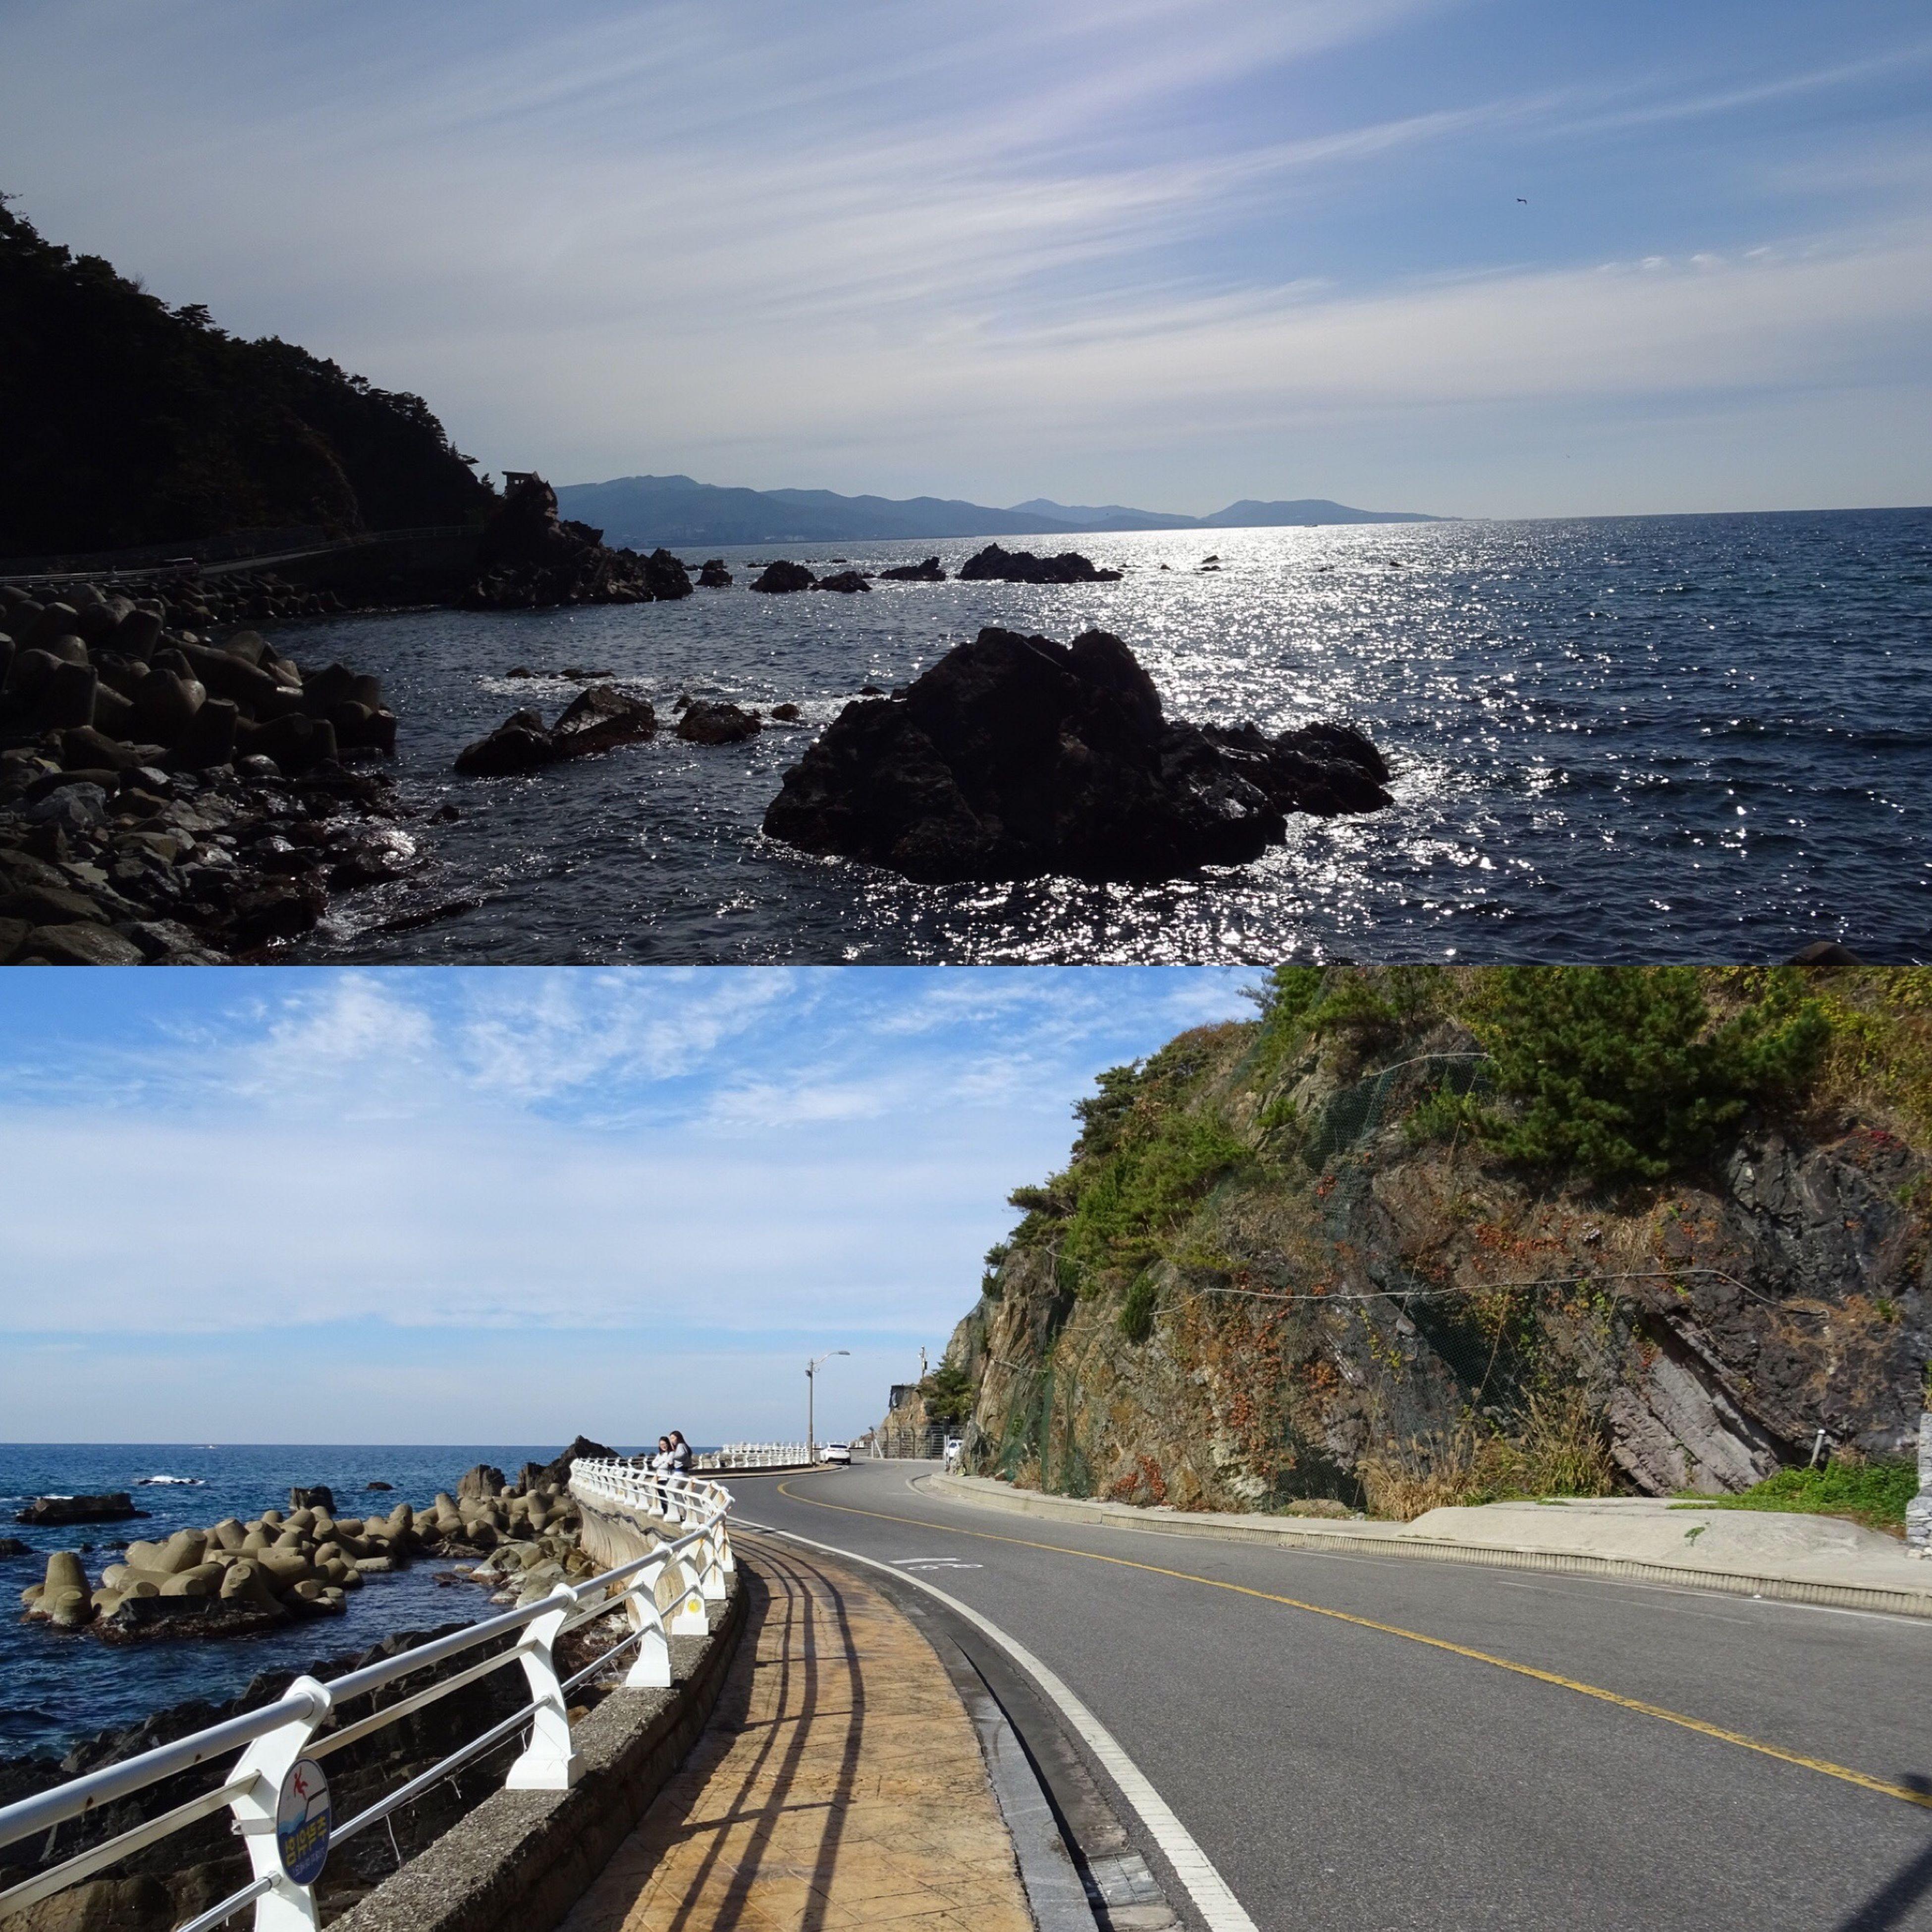 Today, Take a drive along the coast road Starting A Trip Traveling Take A Photo Sea Coast Road The East East Sea Walking